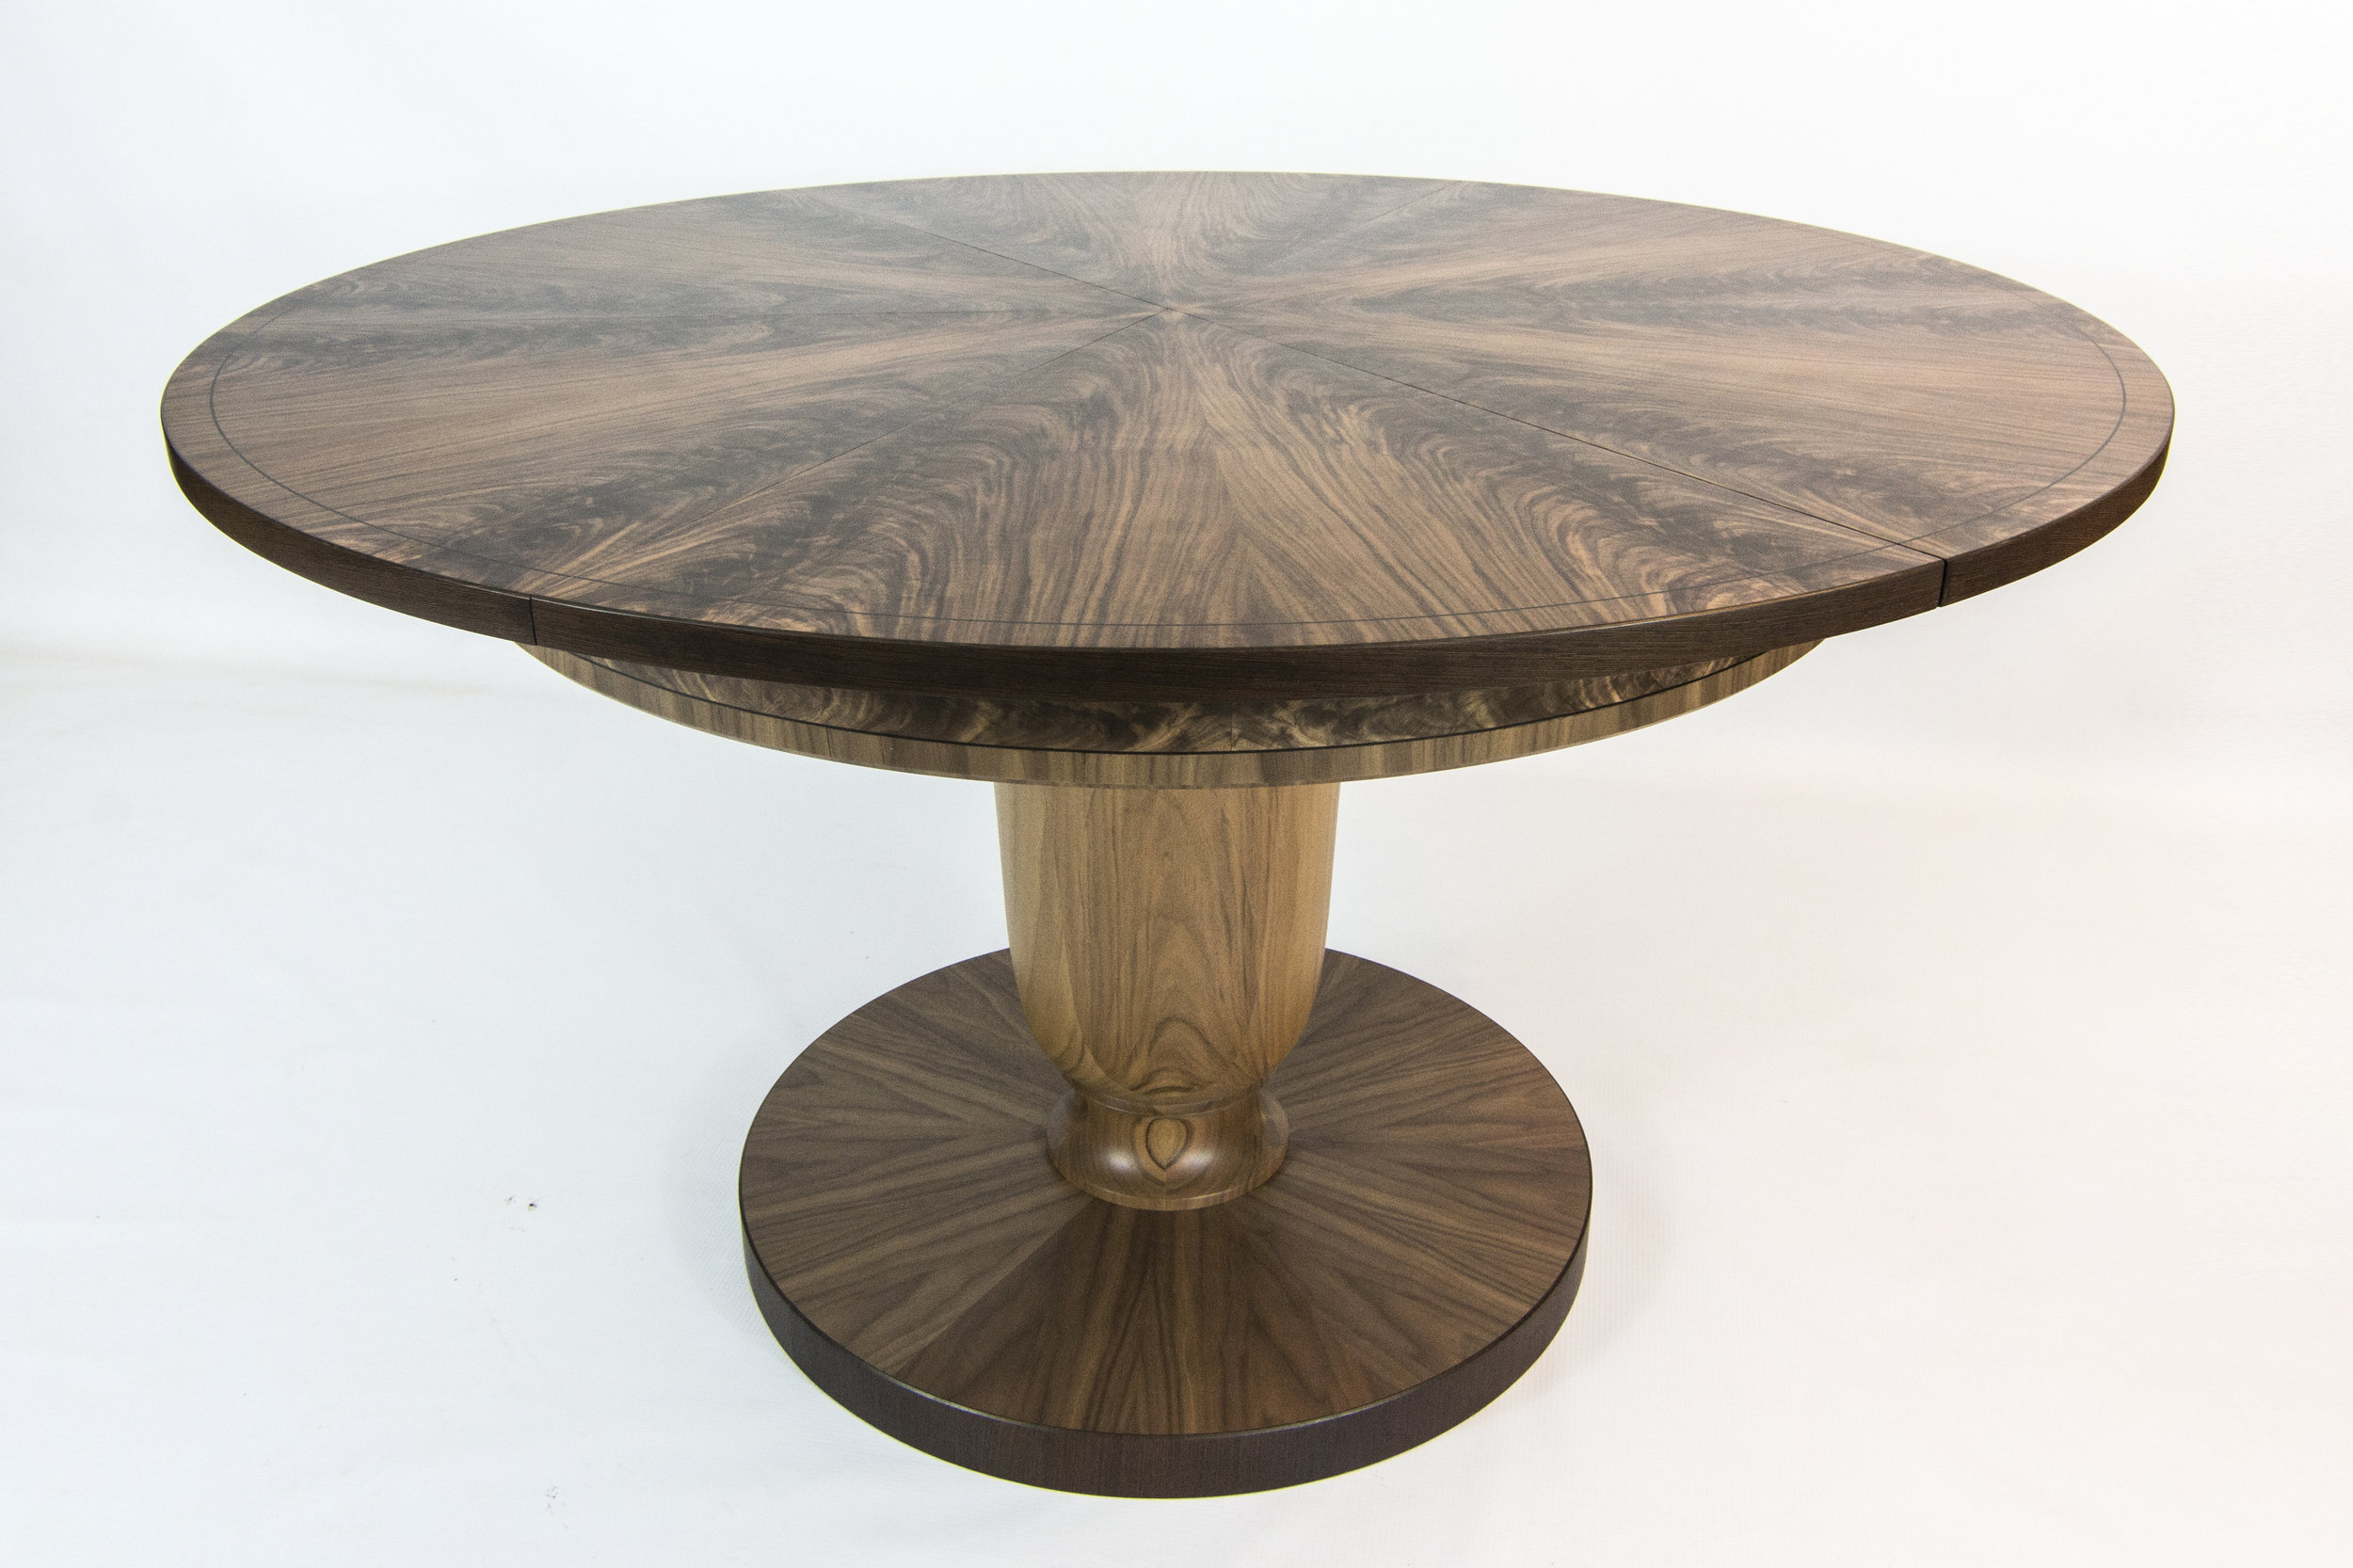 Walnut and Wenge table 1.6m 01.jpg